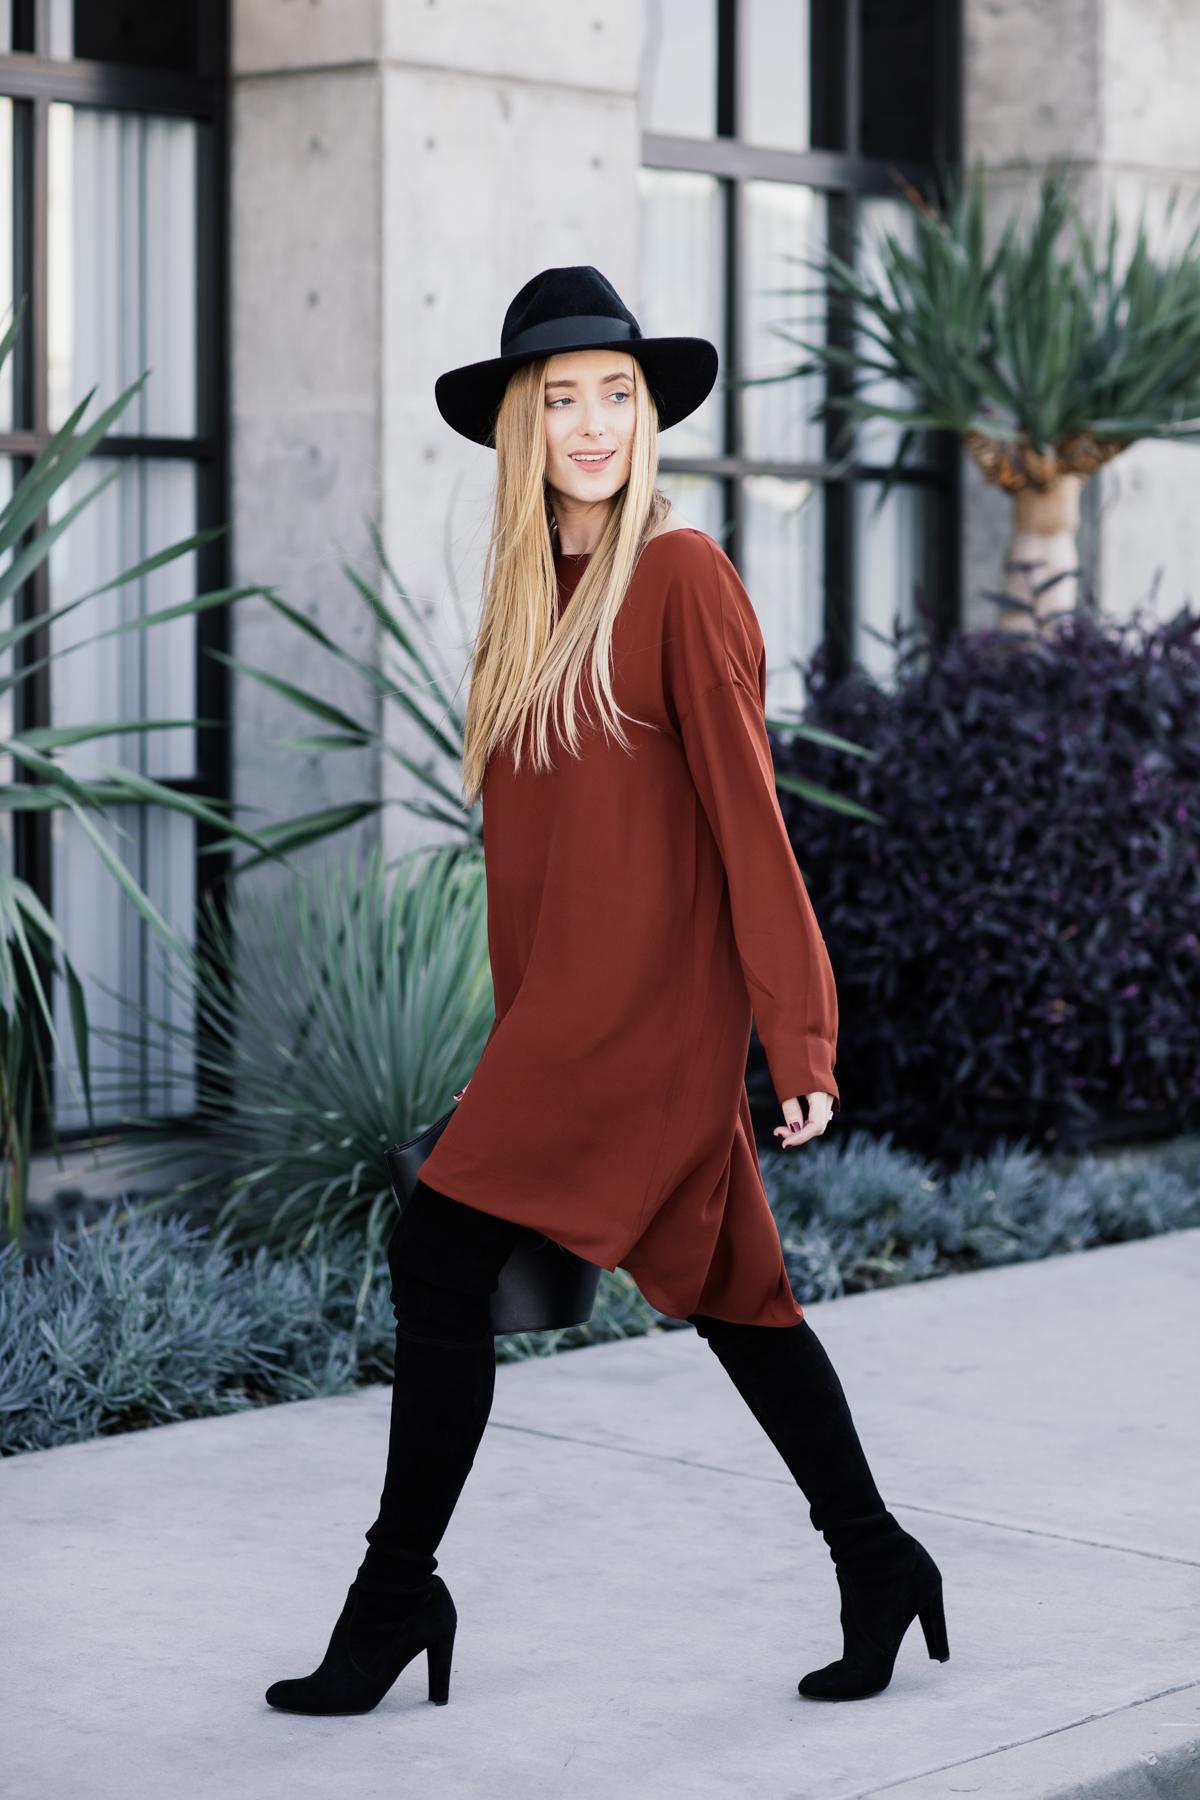 Pumpkin Spice Fashion Lifestyle Blog By Kimberly Pesch